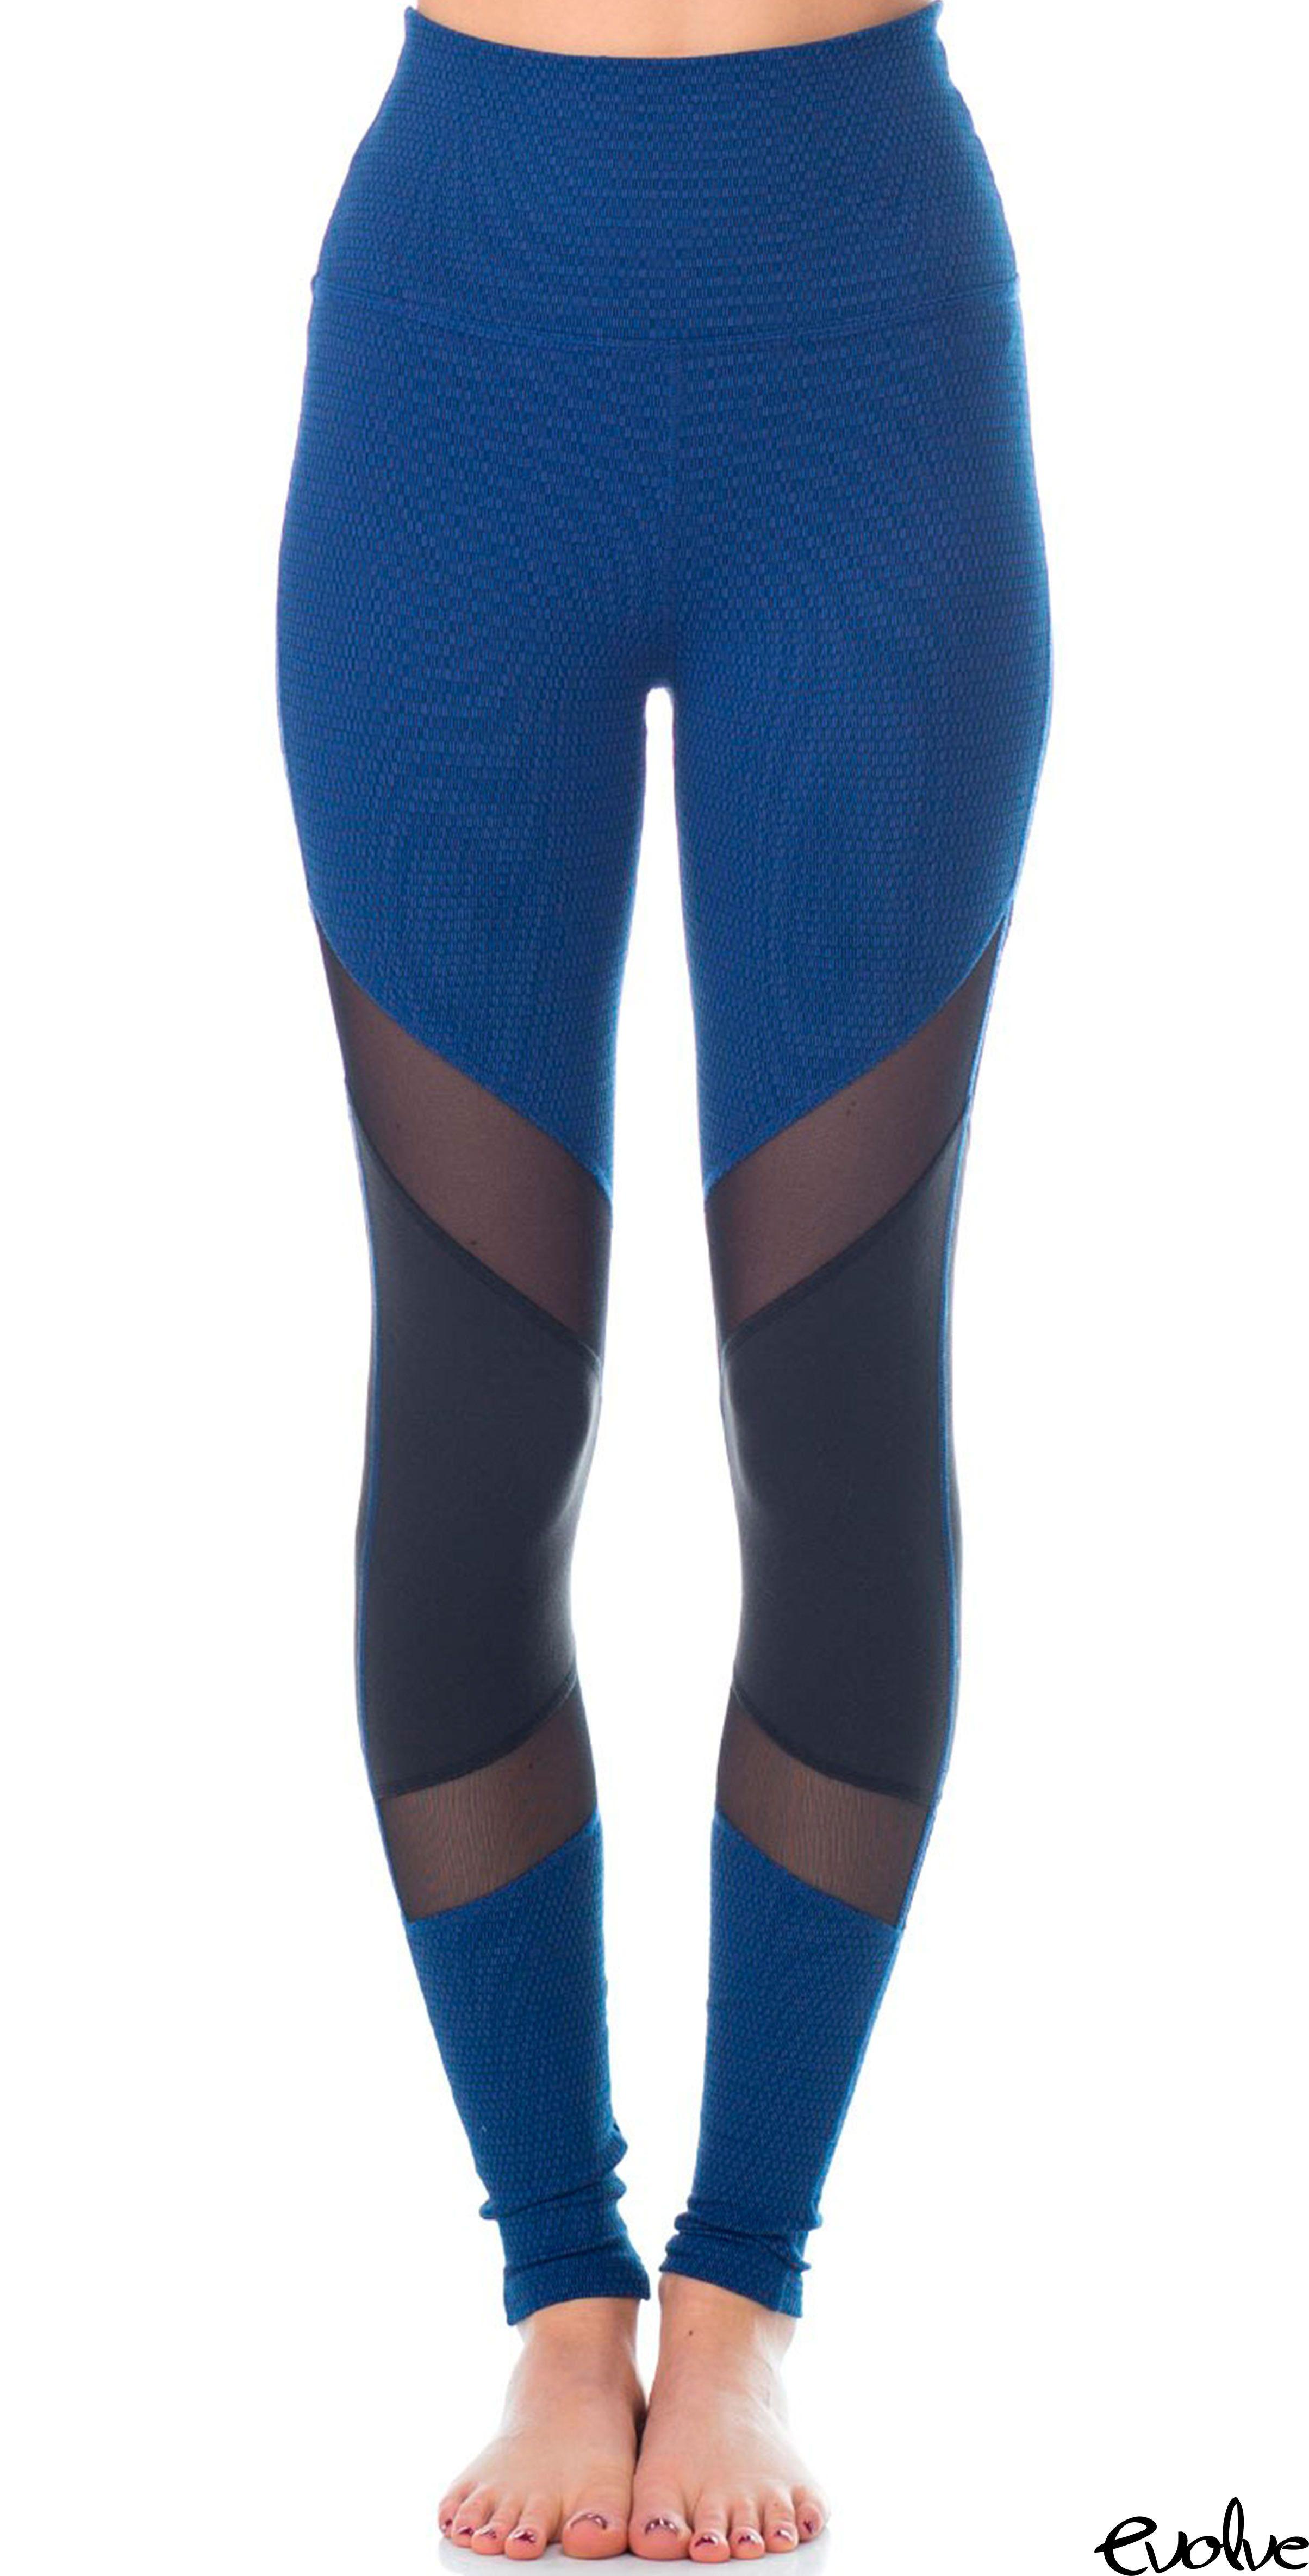 3c0674dbde32c High-waist, royal blue leggings will have everyone turning their heads!  Shop Beyond Yoga now at www.evolvefitwear.com.